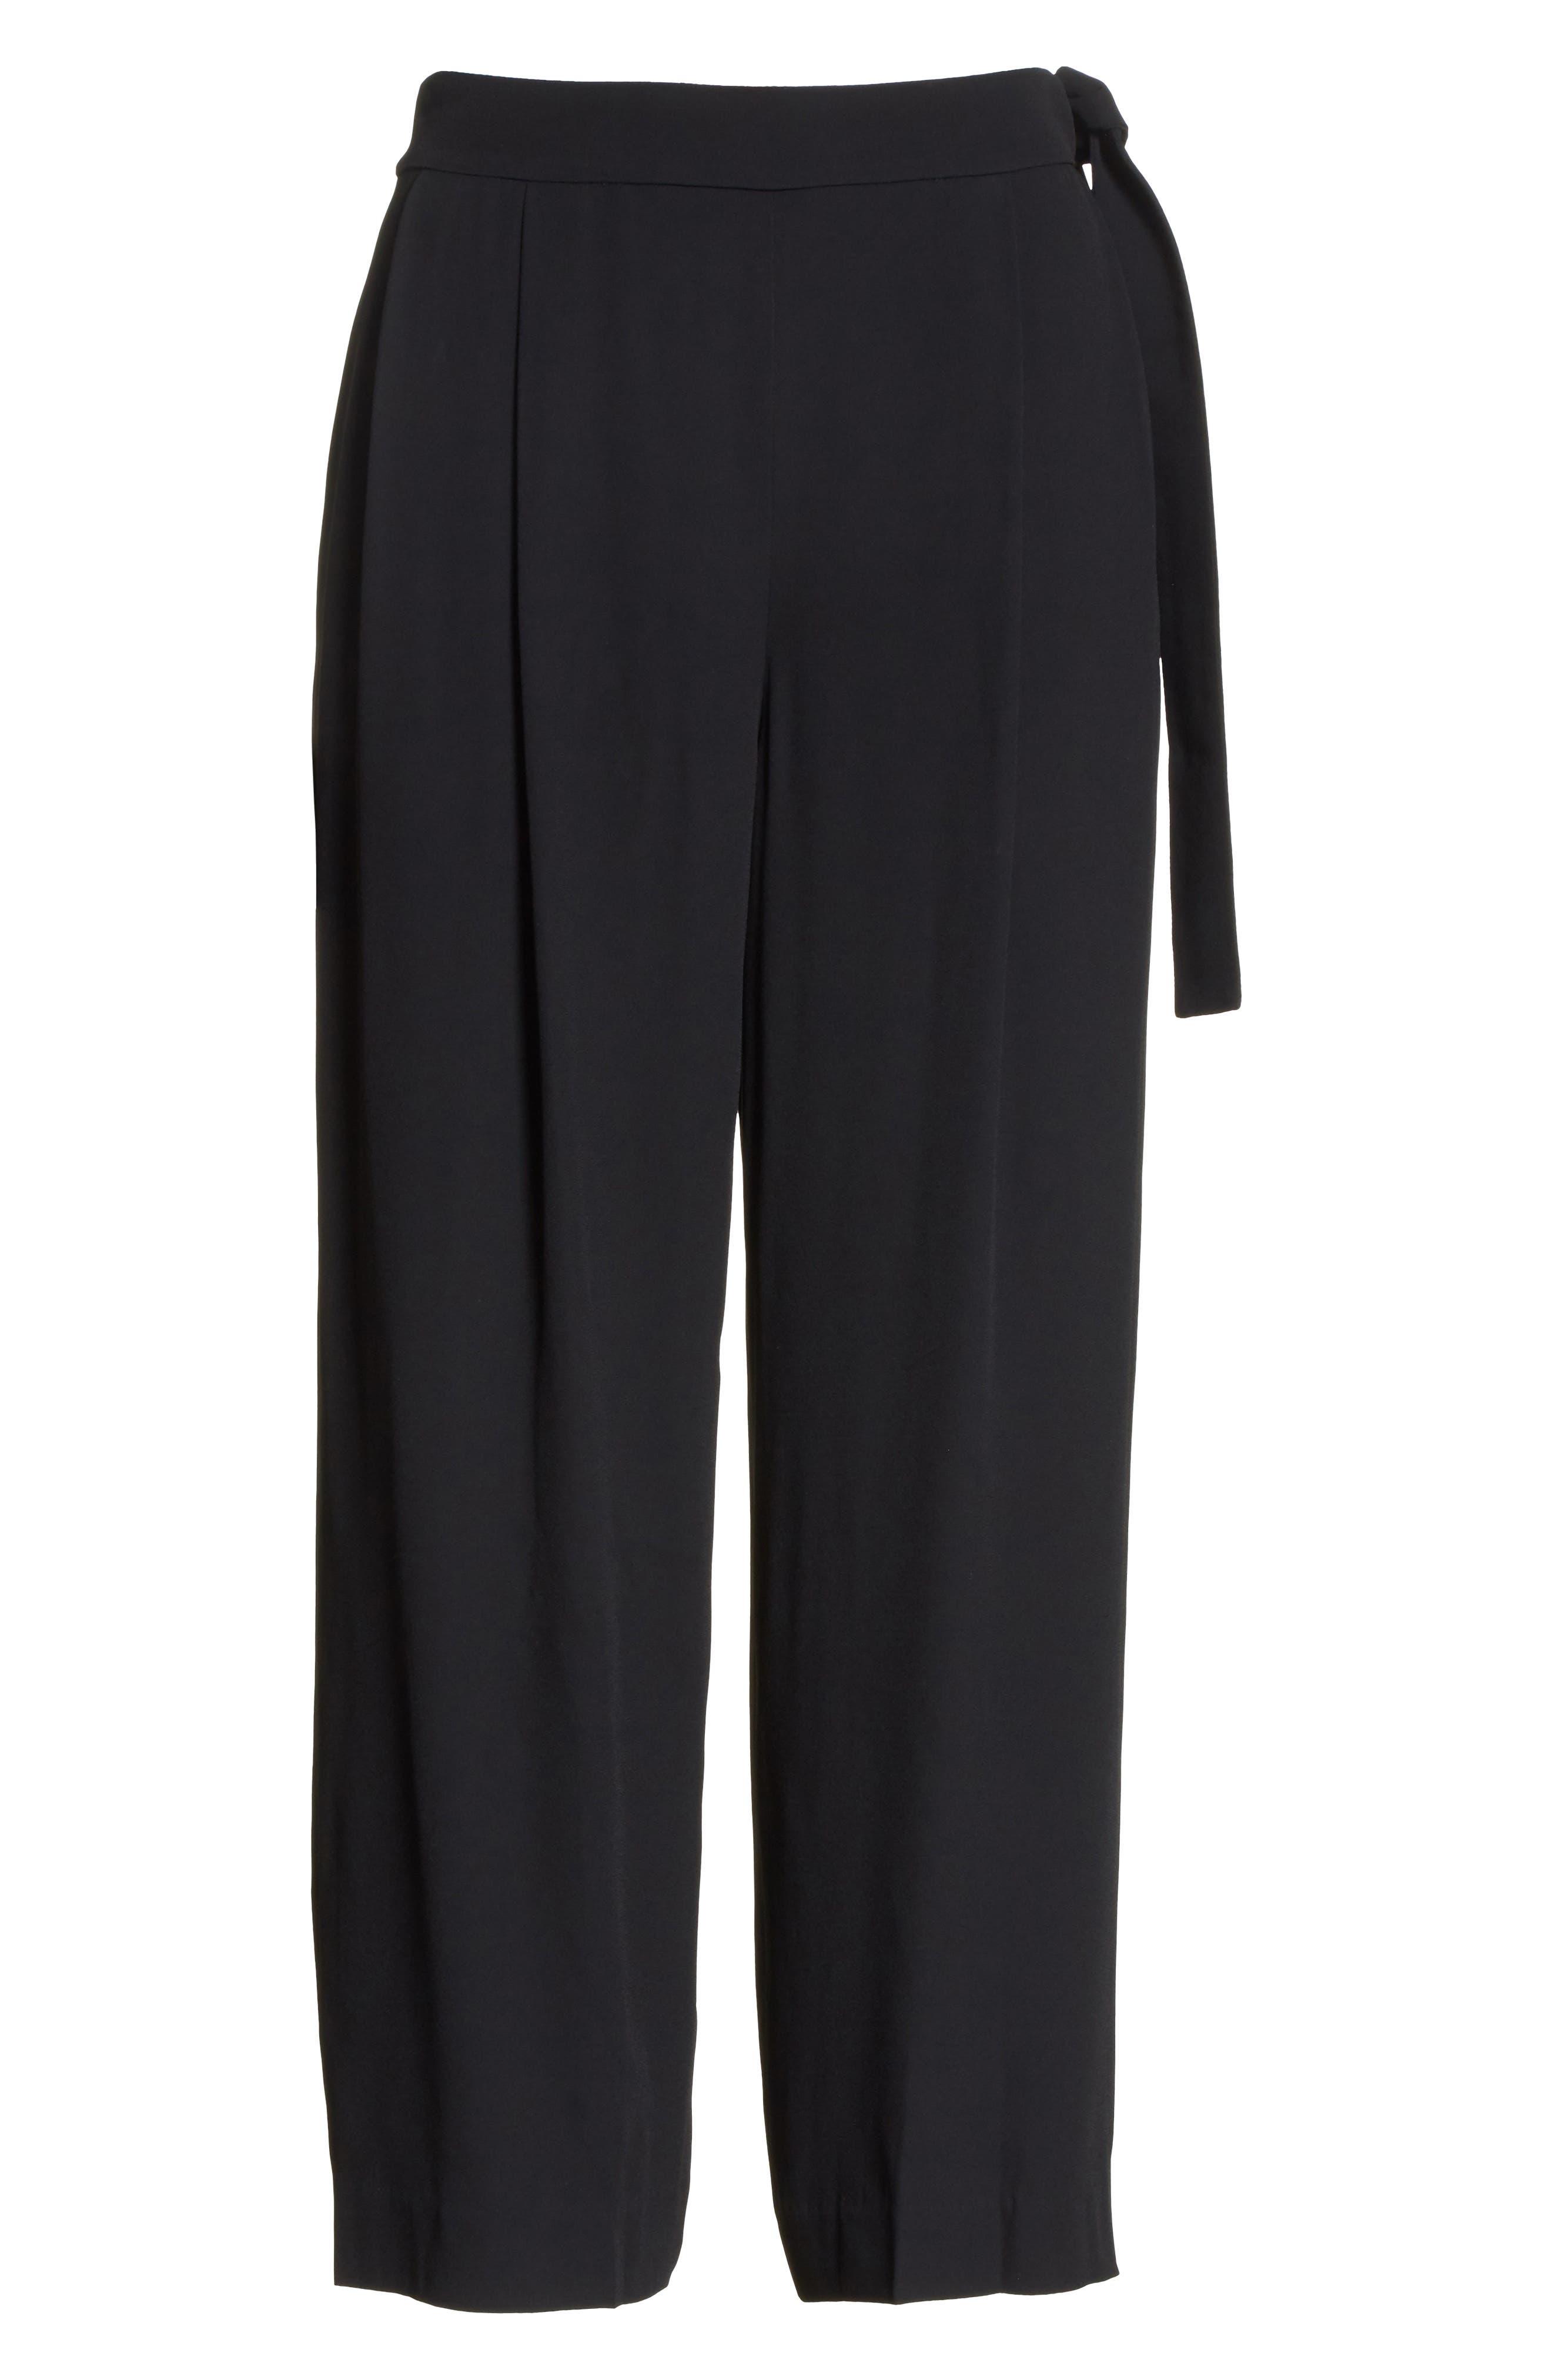 Belted Culottes,                             Alternate thumbnail 6, color,                             Black